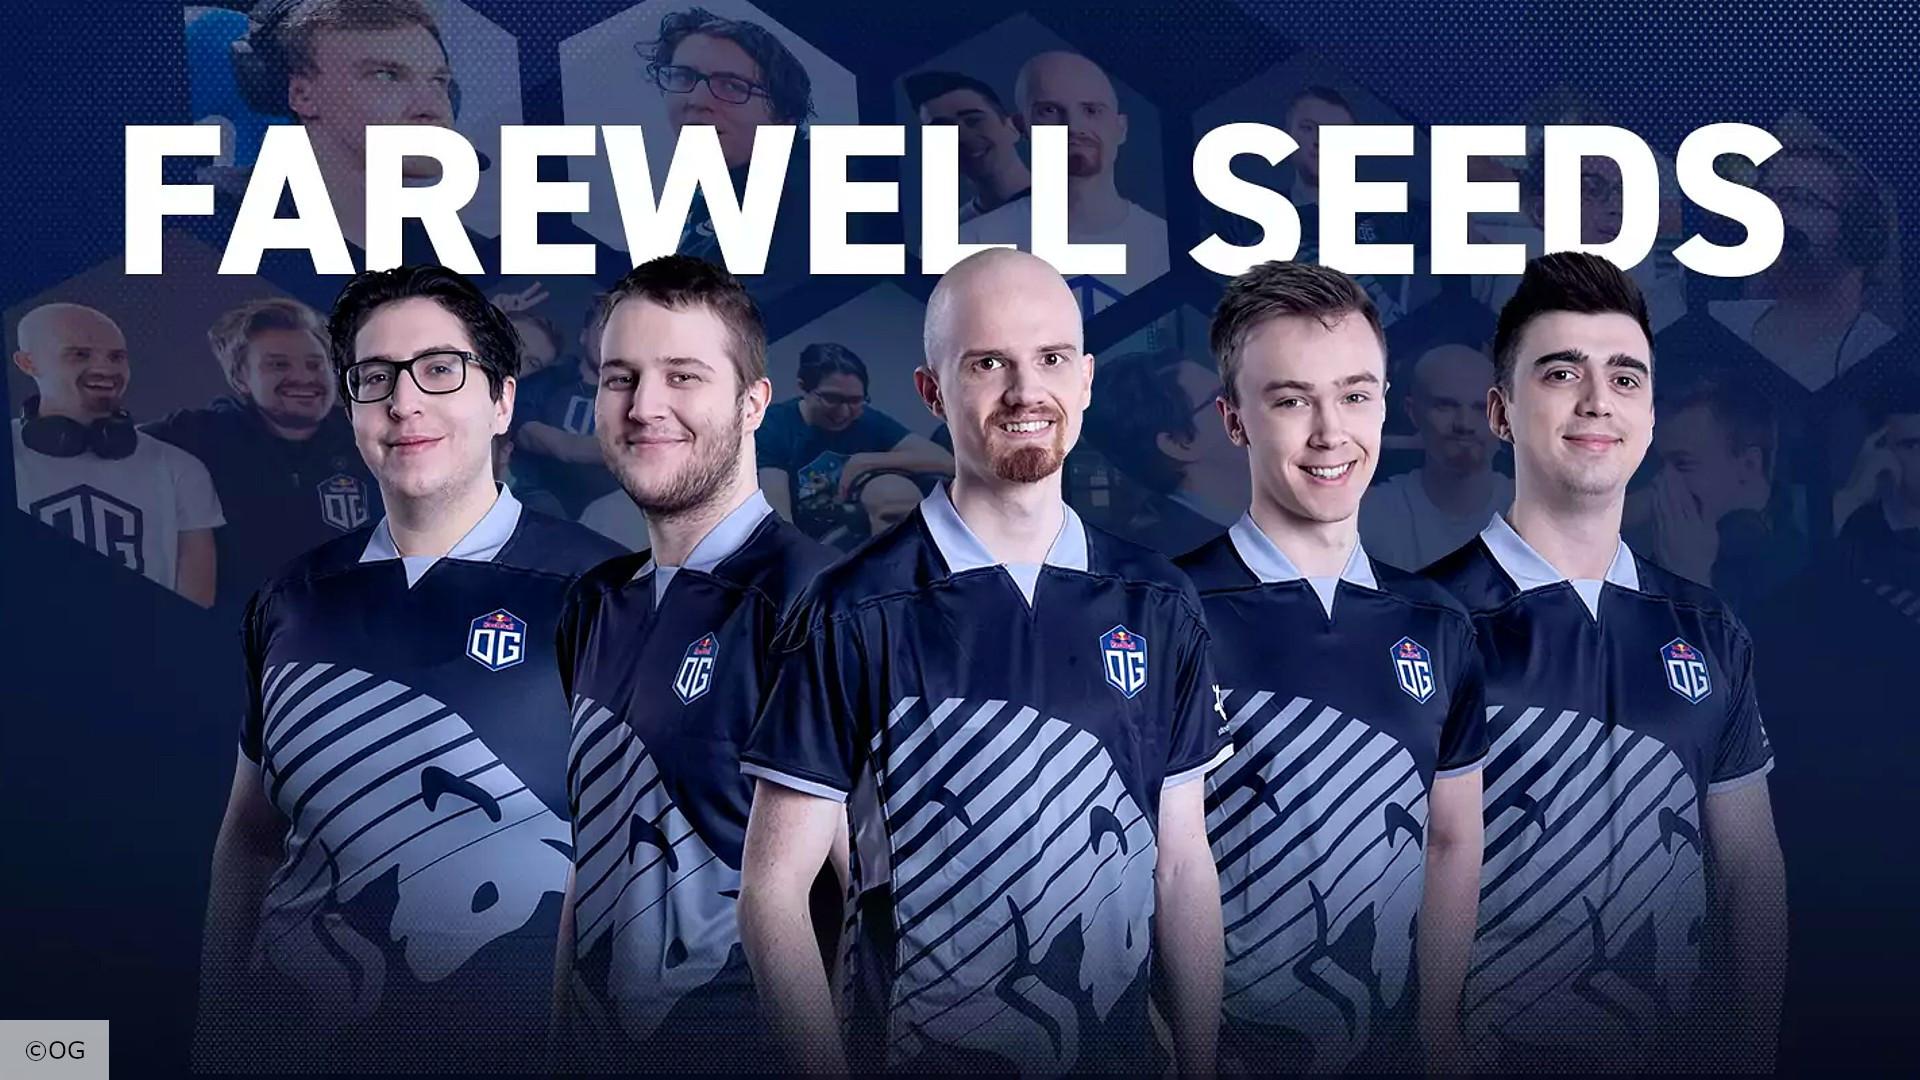 Team Og Seeds